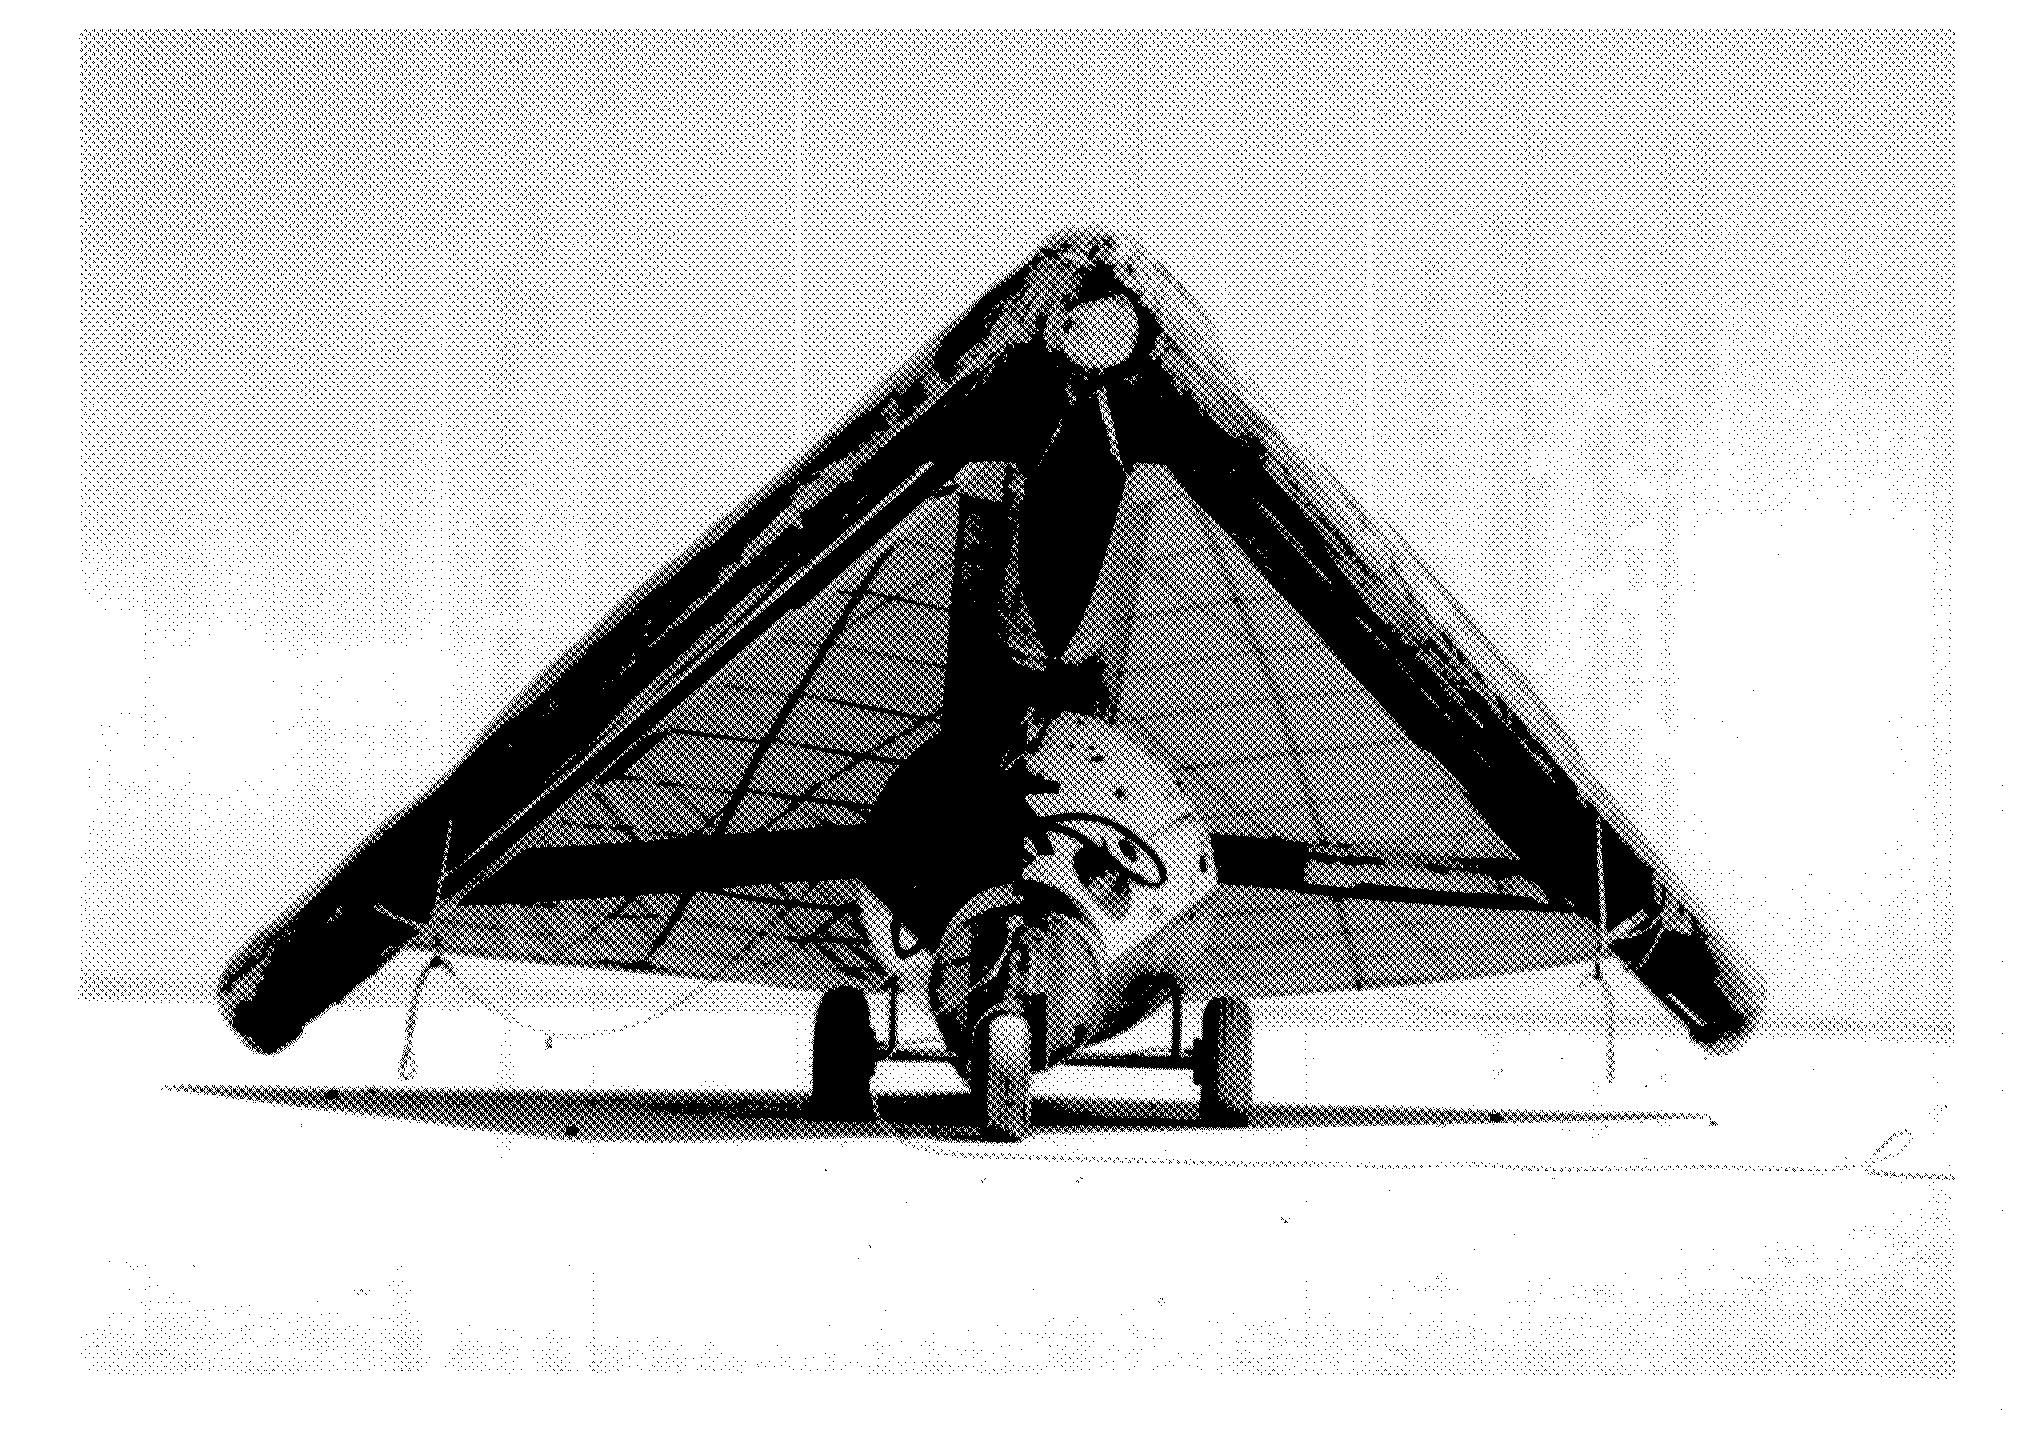 rogallo-wing-model.jpg